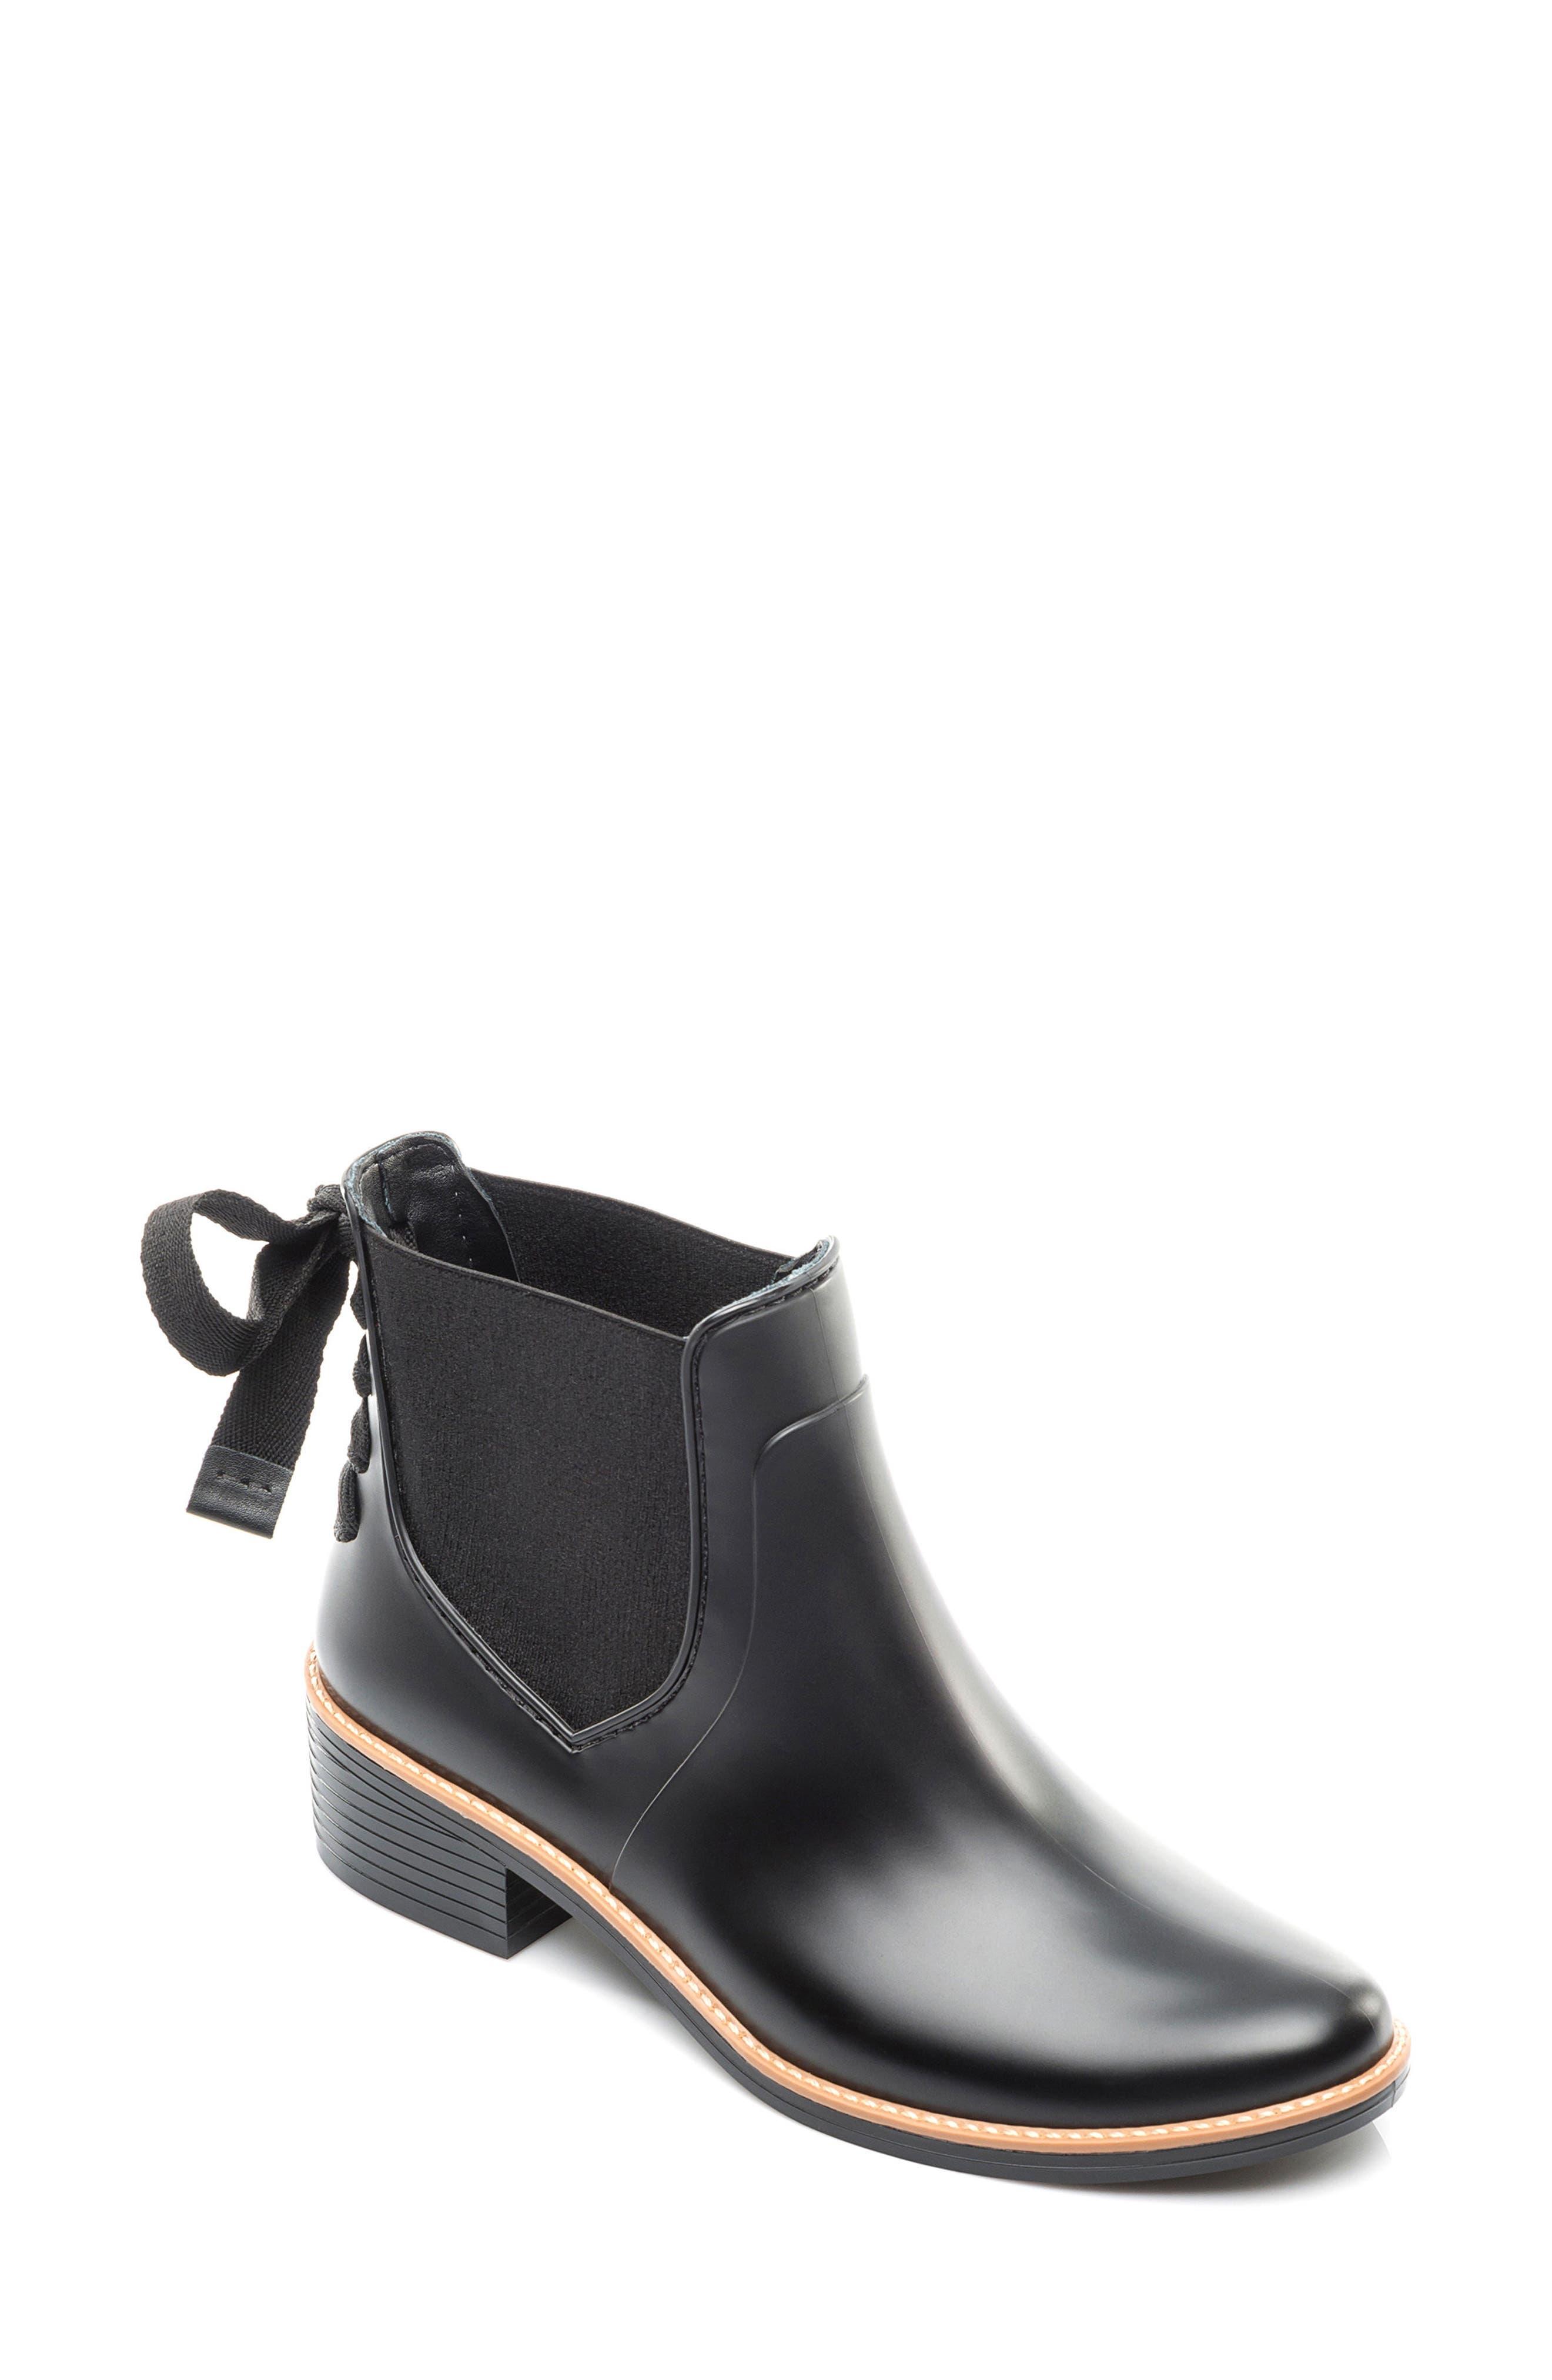 BERNARDO, Paxton Waterproof Rain Boot, Main thumbnail 1, color, BLACK